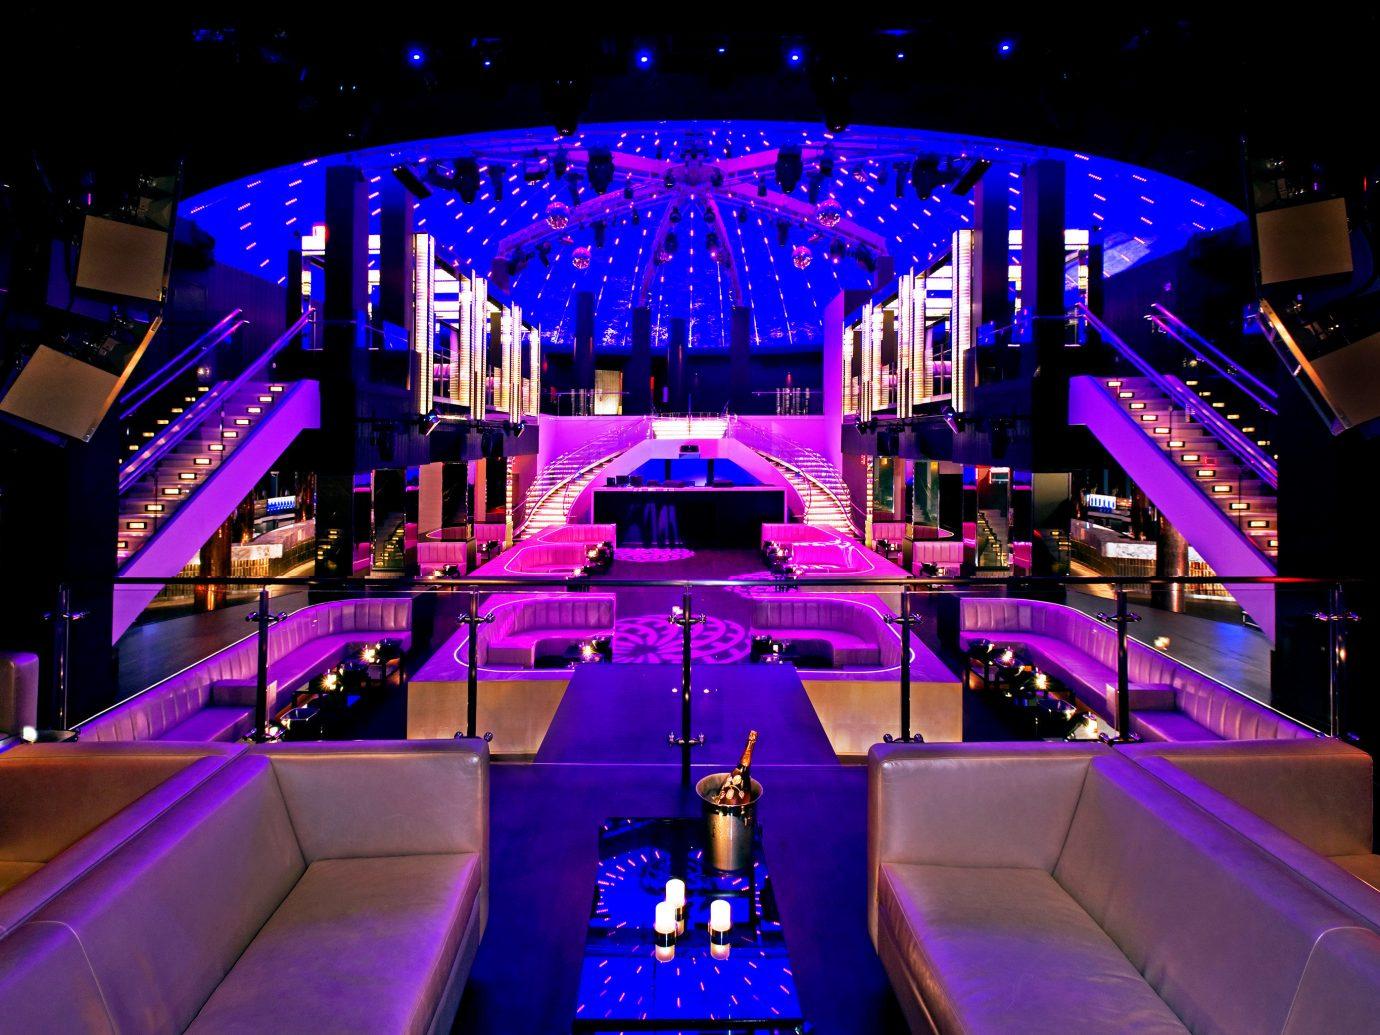 Bar Design Food + Drink Lounge Nightlife Party Play Resort indoor nightclub night light stage